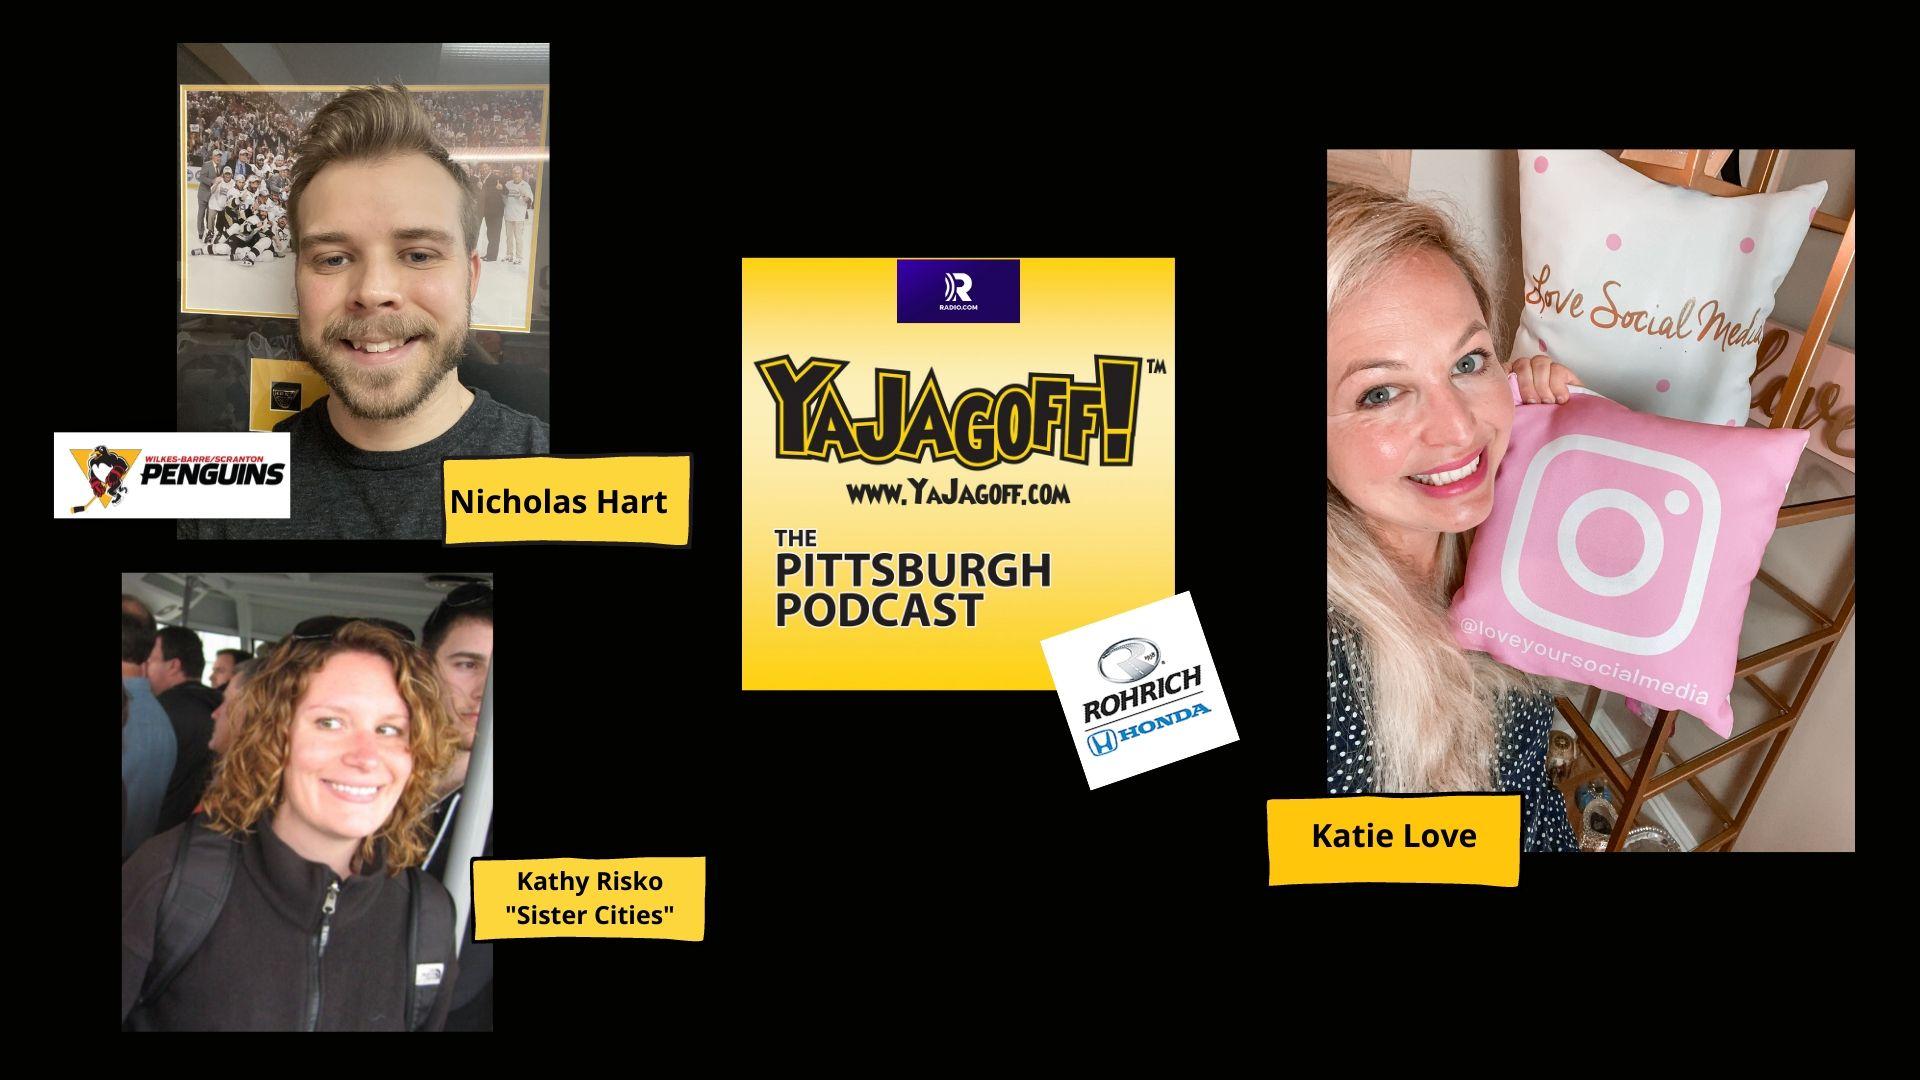 YaJagoff Podcast Wit Nicholas Hart